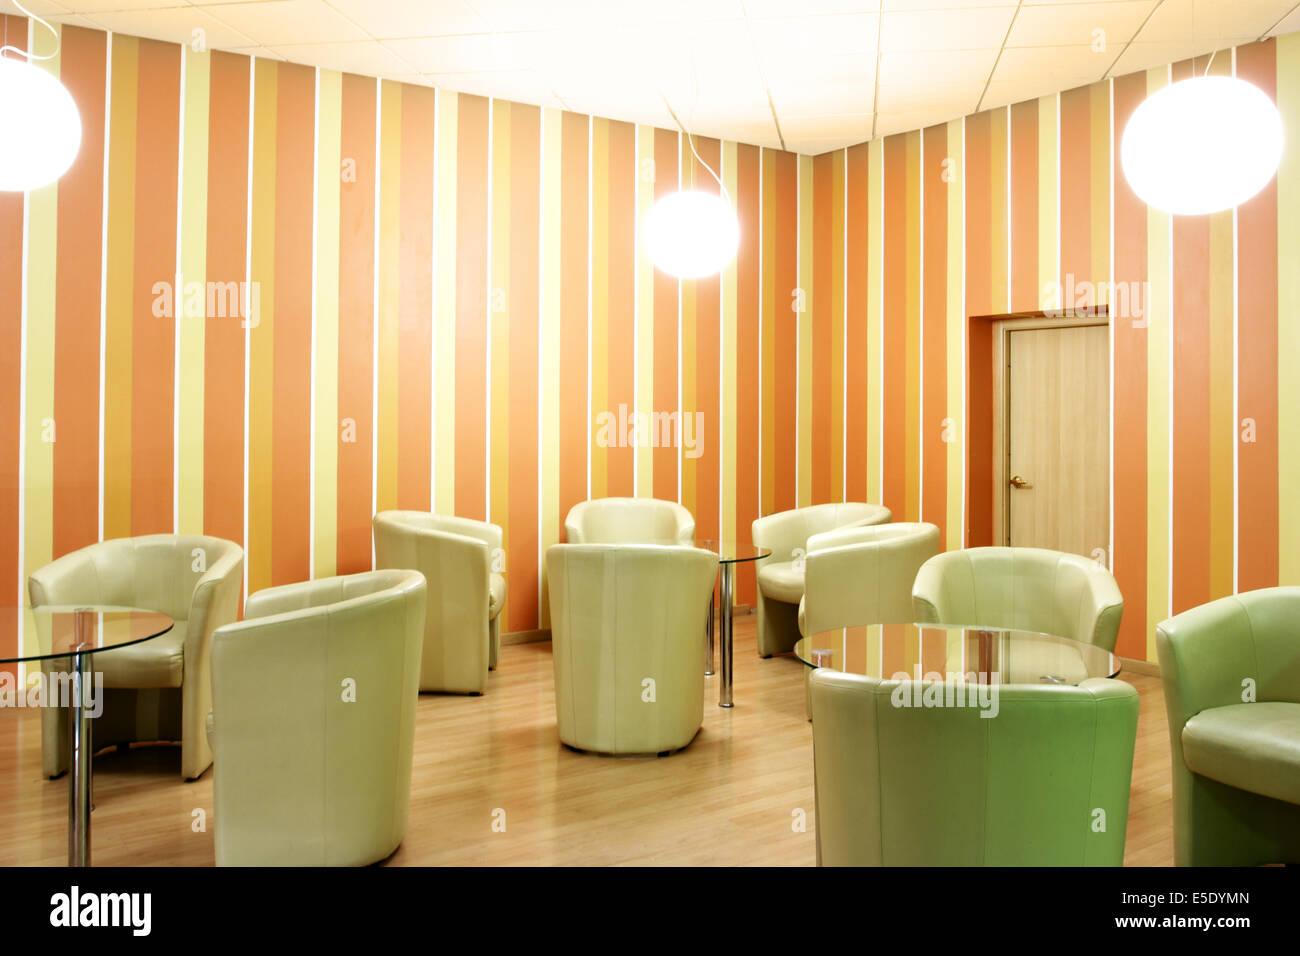 Modernes Interieur der Lobby mit Ledersessel Stockfoto, Bild ...